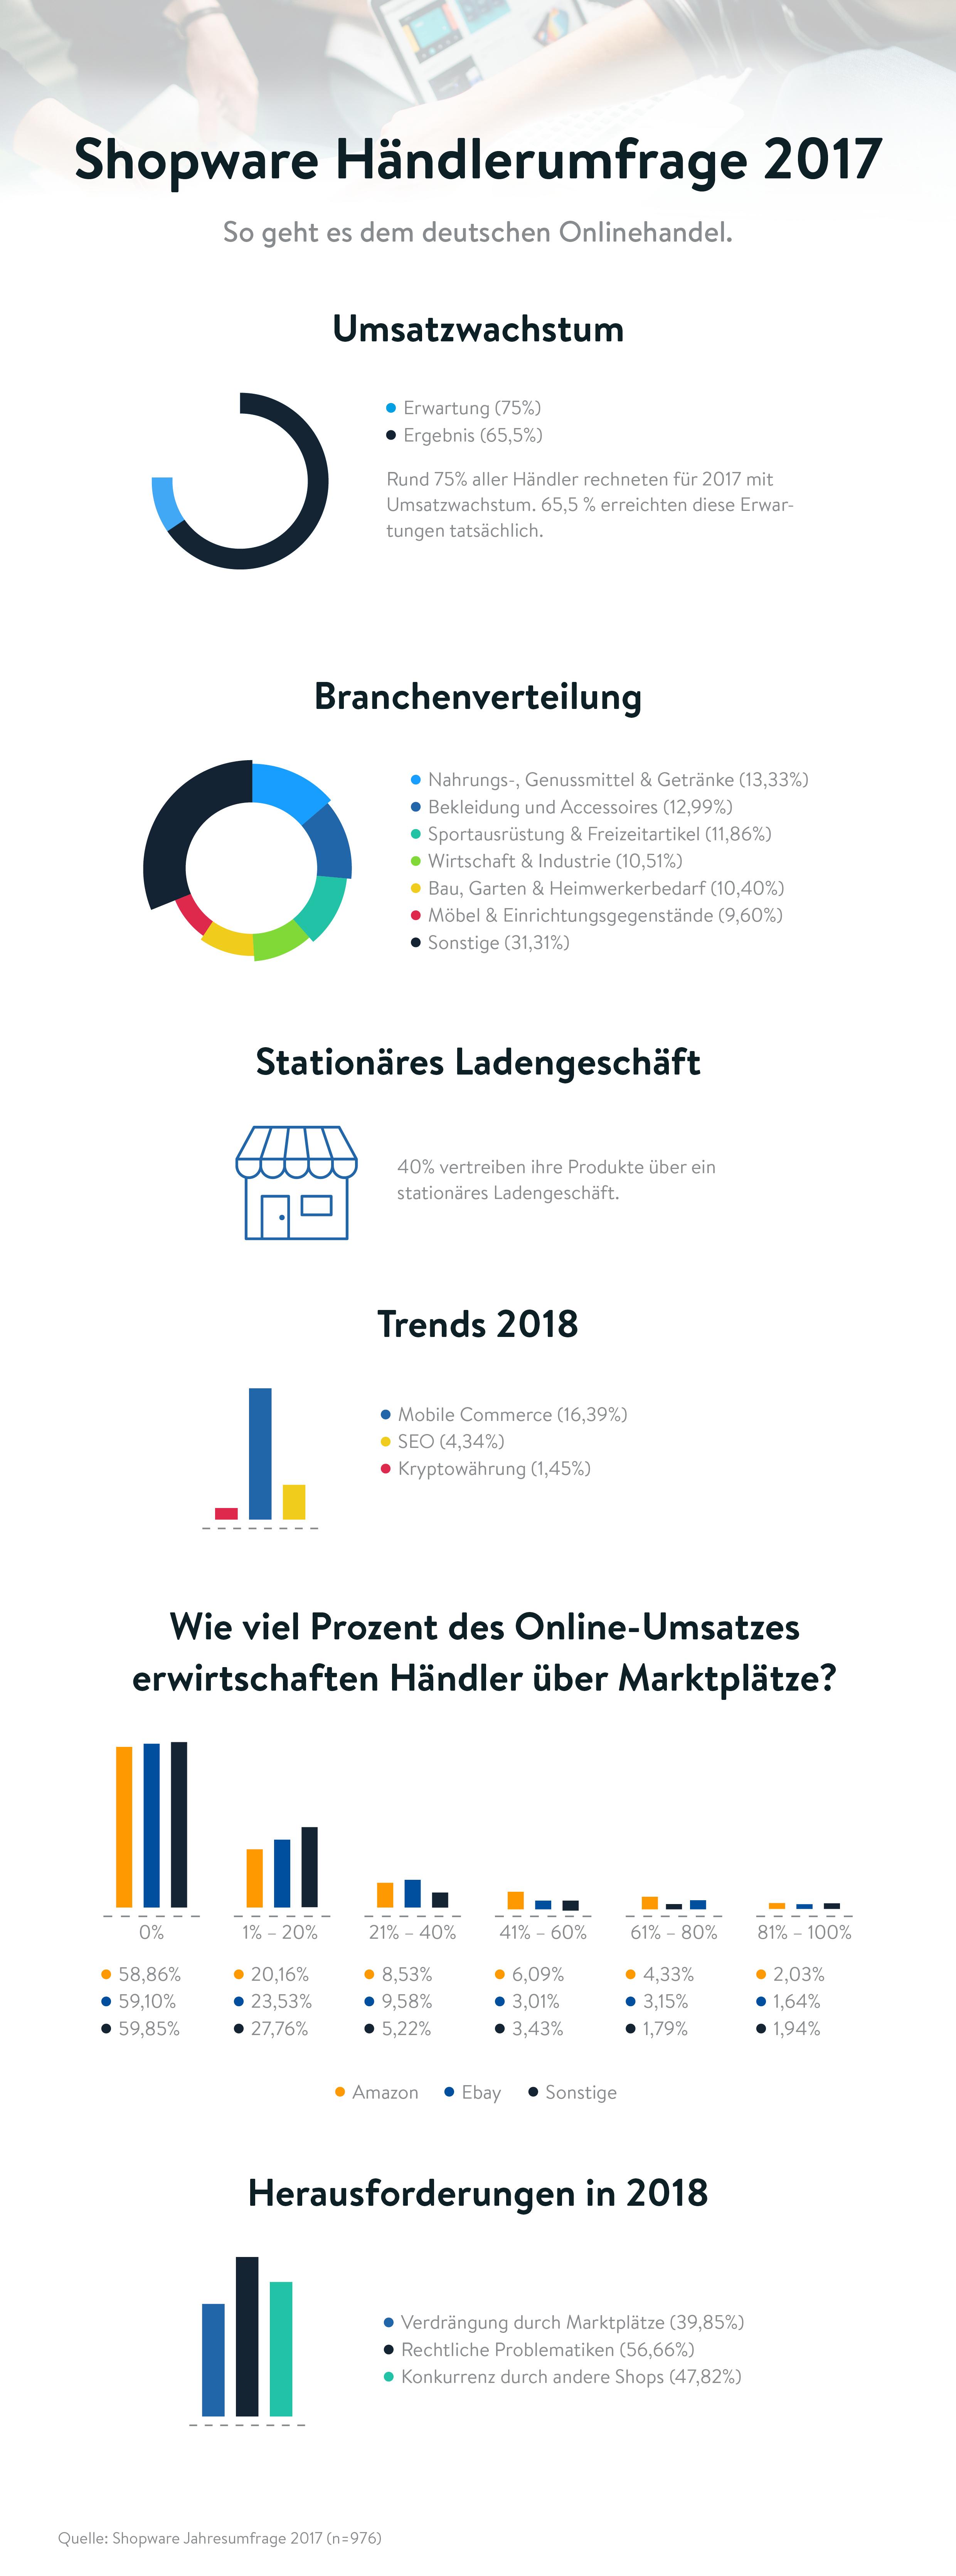 Infografik der Shopware Haendlerumfrage 2017